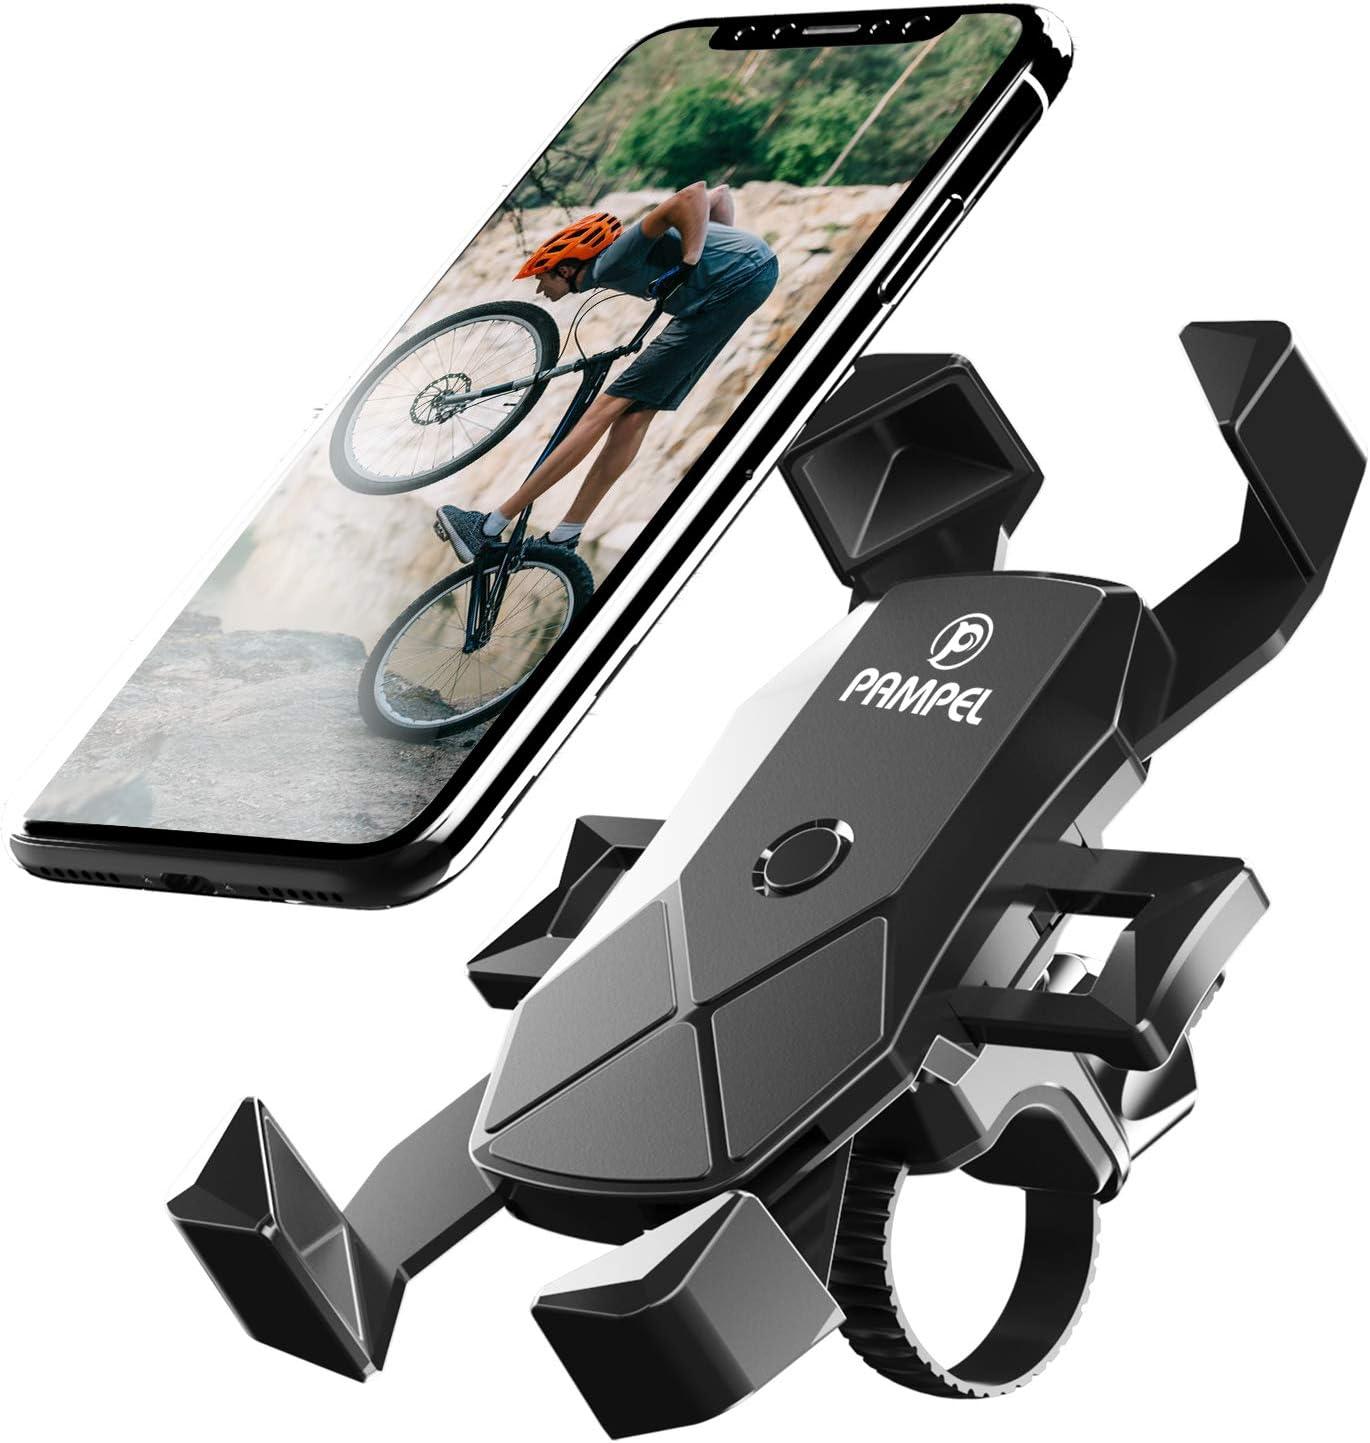 Pampel Fahrrad Handyhalterung Automatische Verriegelung Elektronik